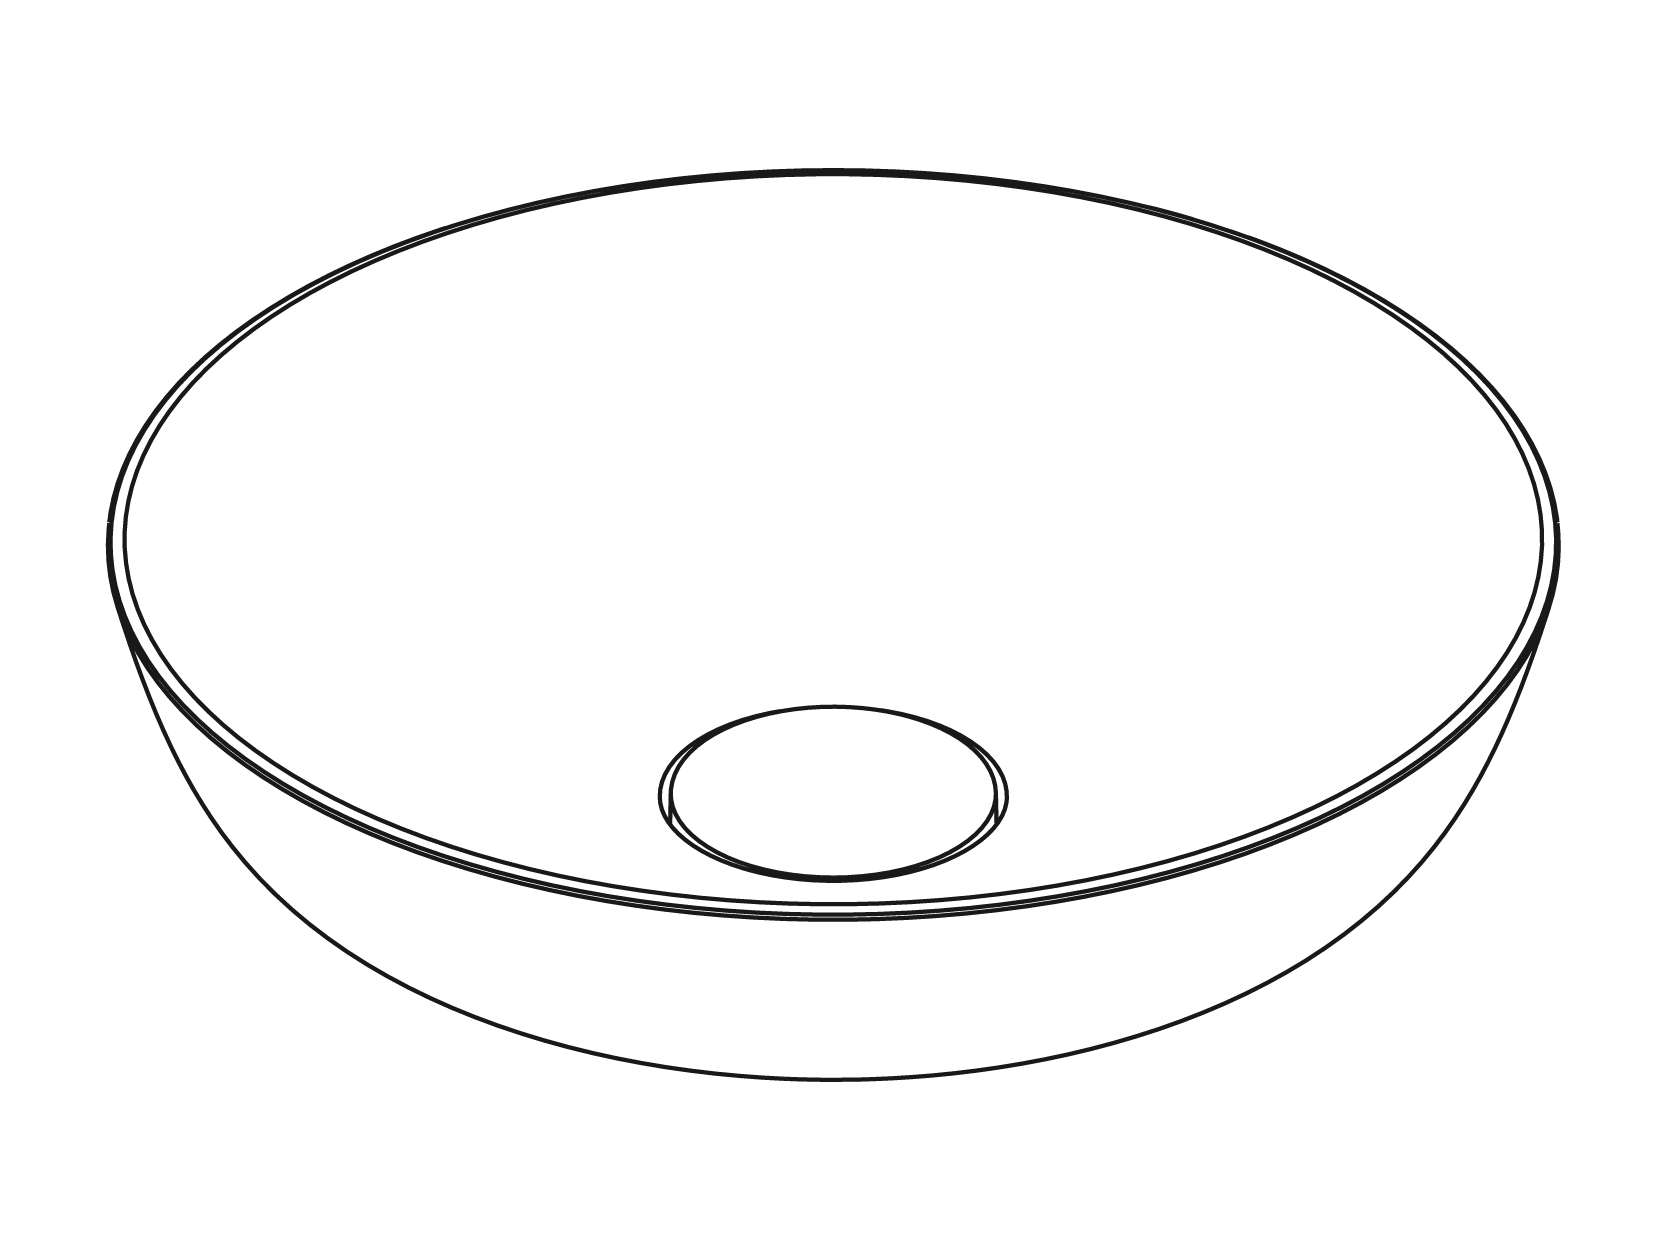 VARS CIRCLE